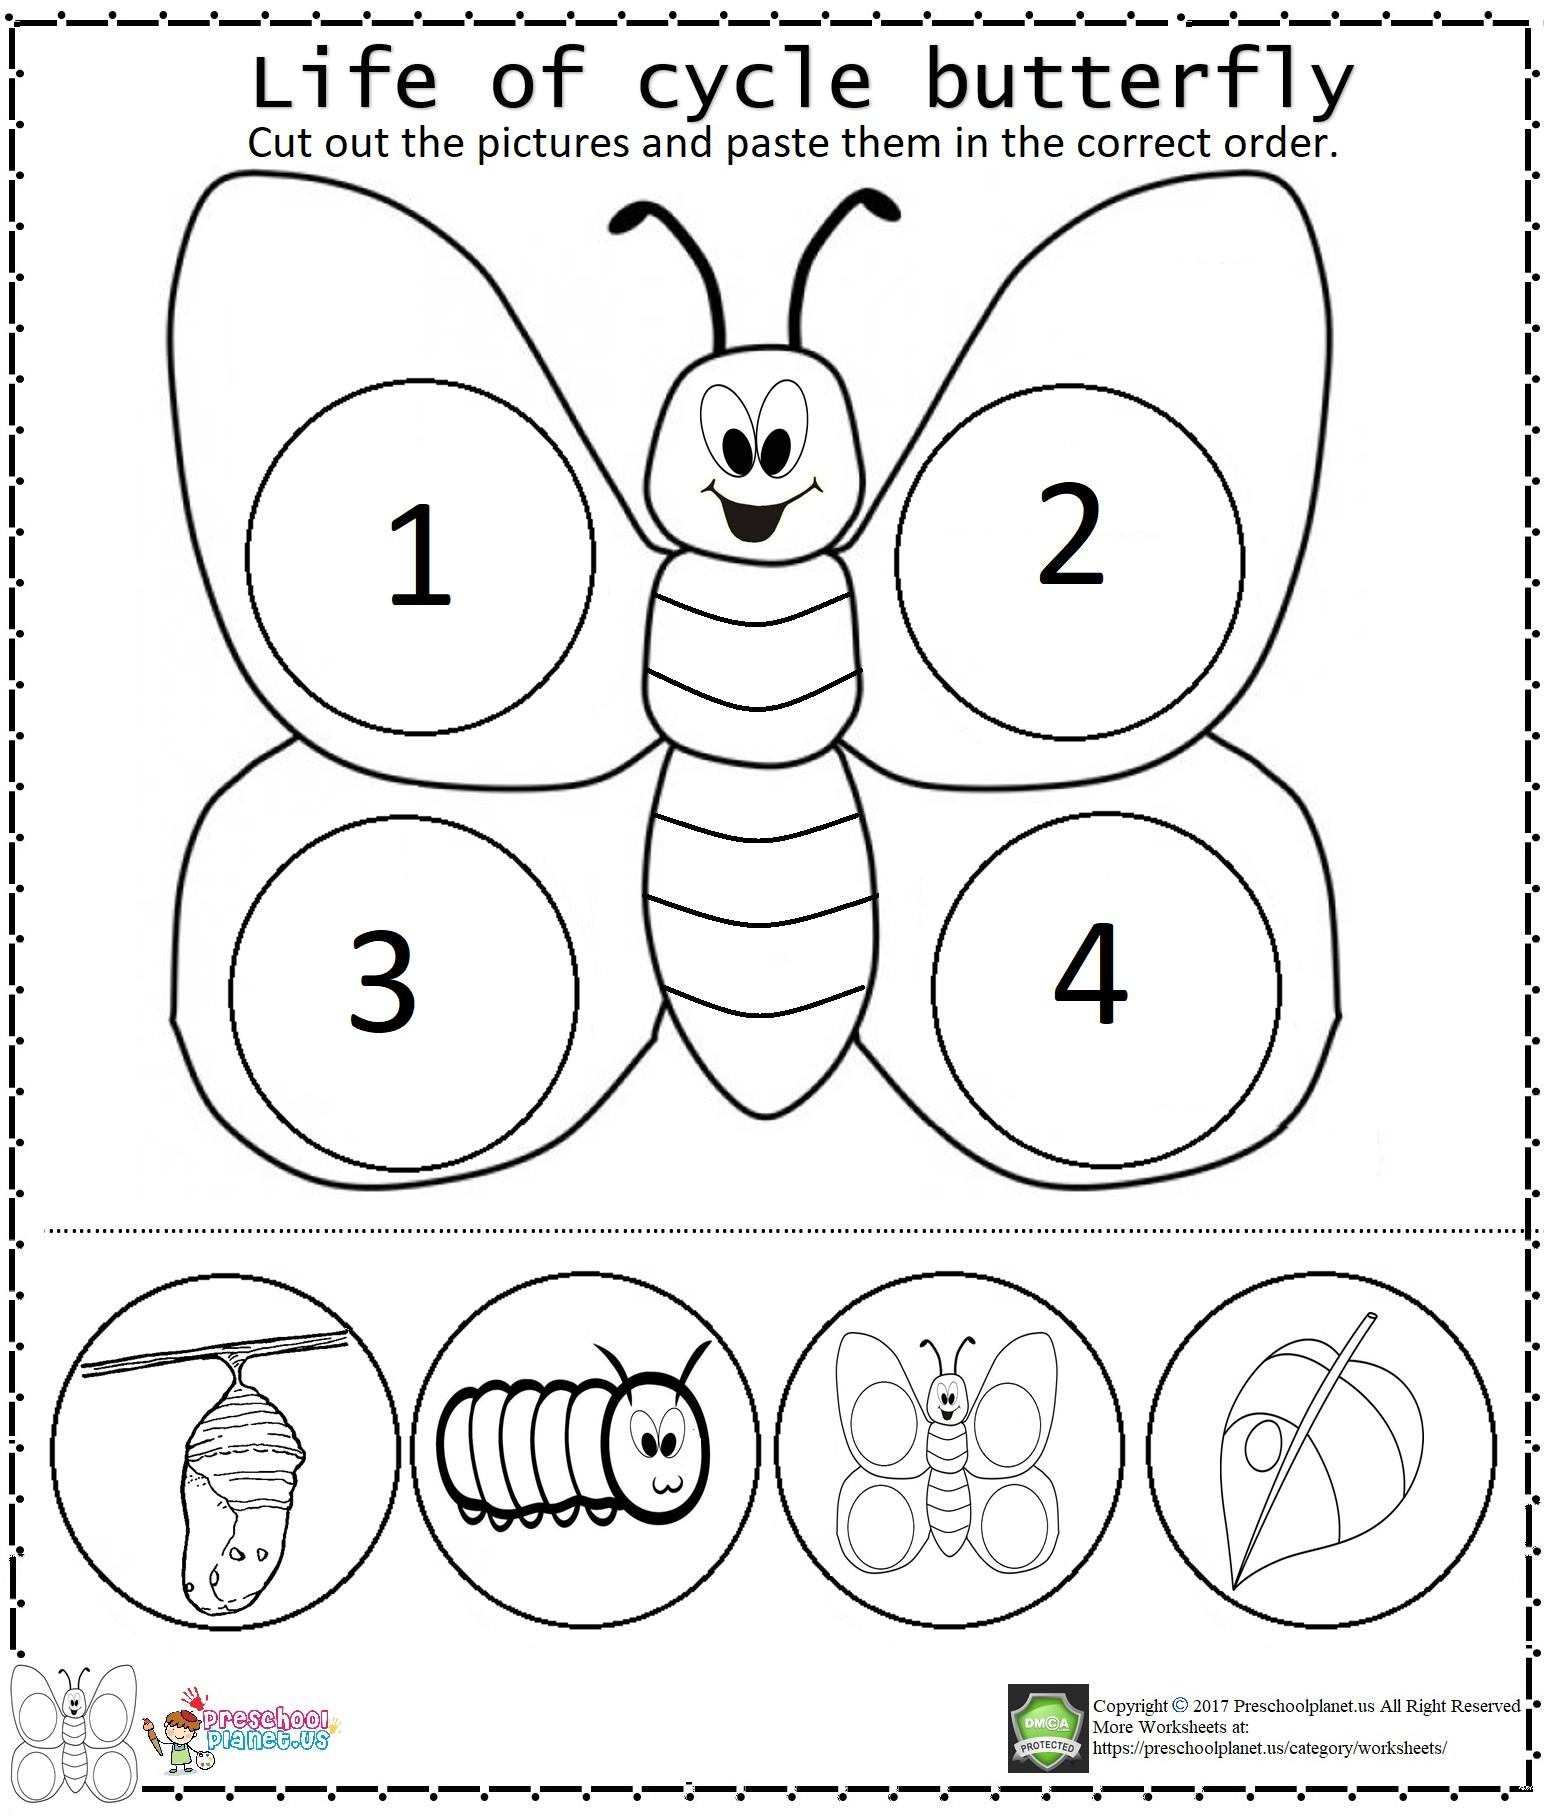 Life Of Cycle Butterfly Worksheet Preschoolplanet